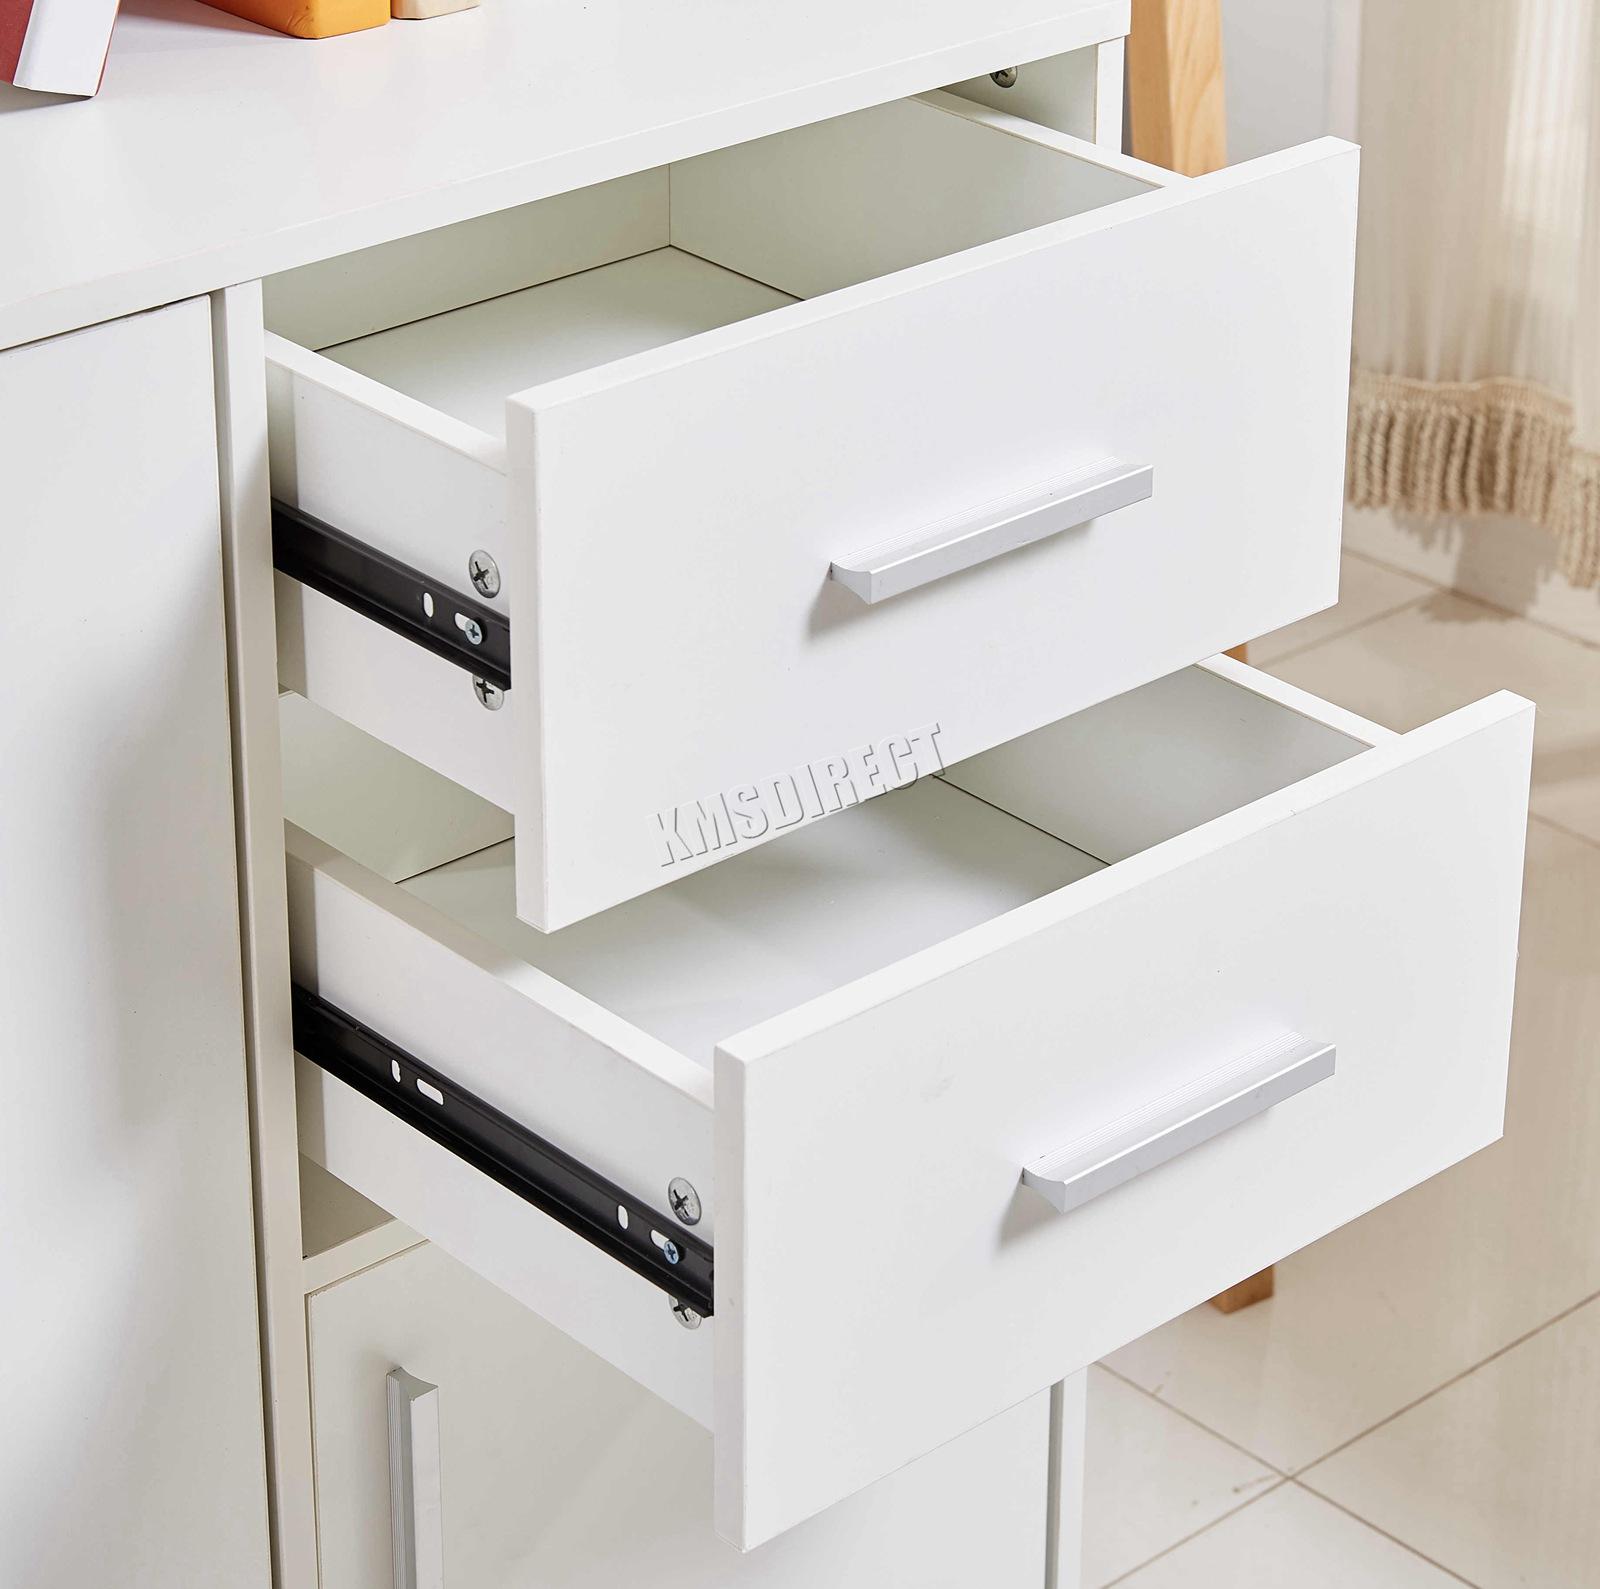 WestWood-Sideboard-Cabinet-Storage-tableware-Kitchen-Cupboard-Unit-PB-SSP01-NEW thumbnail 41